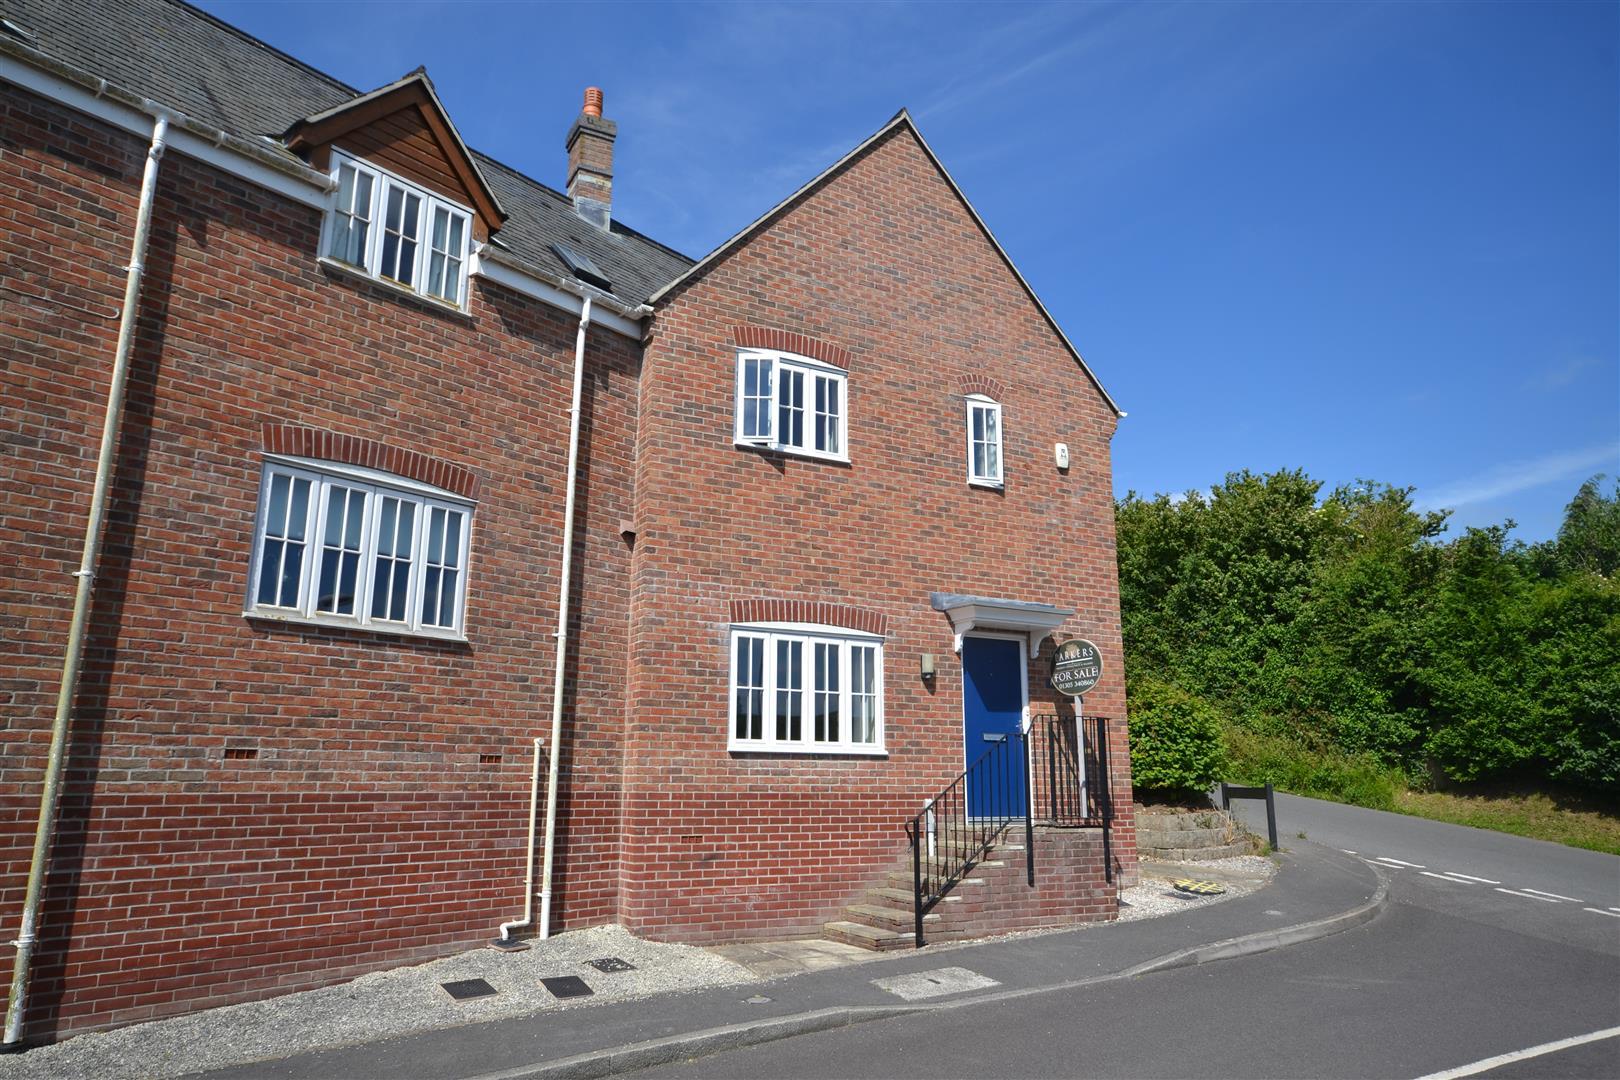 3 Bedrooms Detached House for sale in Charminster, Dorchester